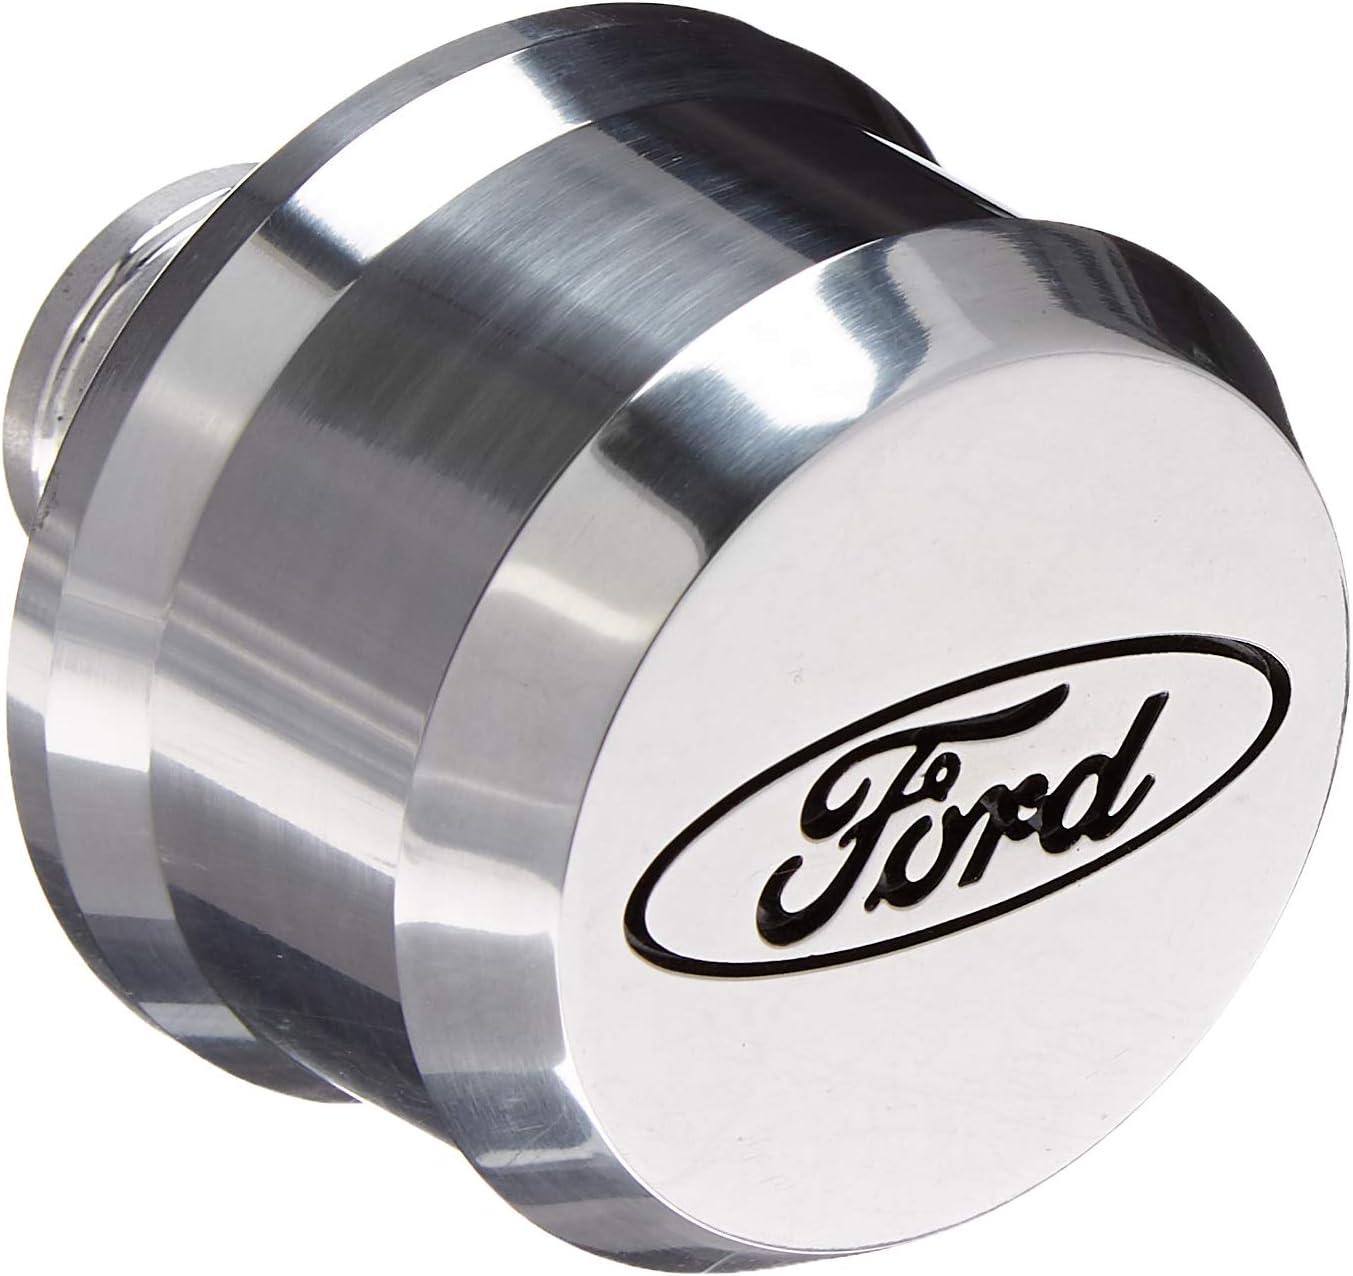 "Proform 302-362 Air Filter kit,13/"" Round,Steel,Black 2.625/"" filter Height"